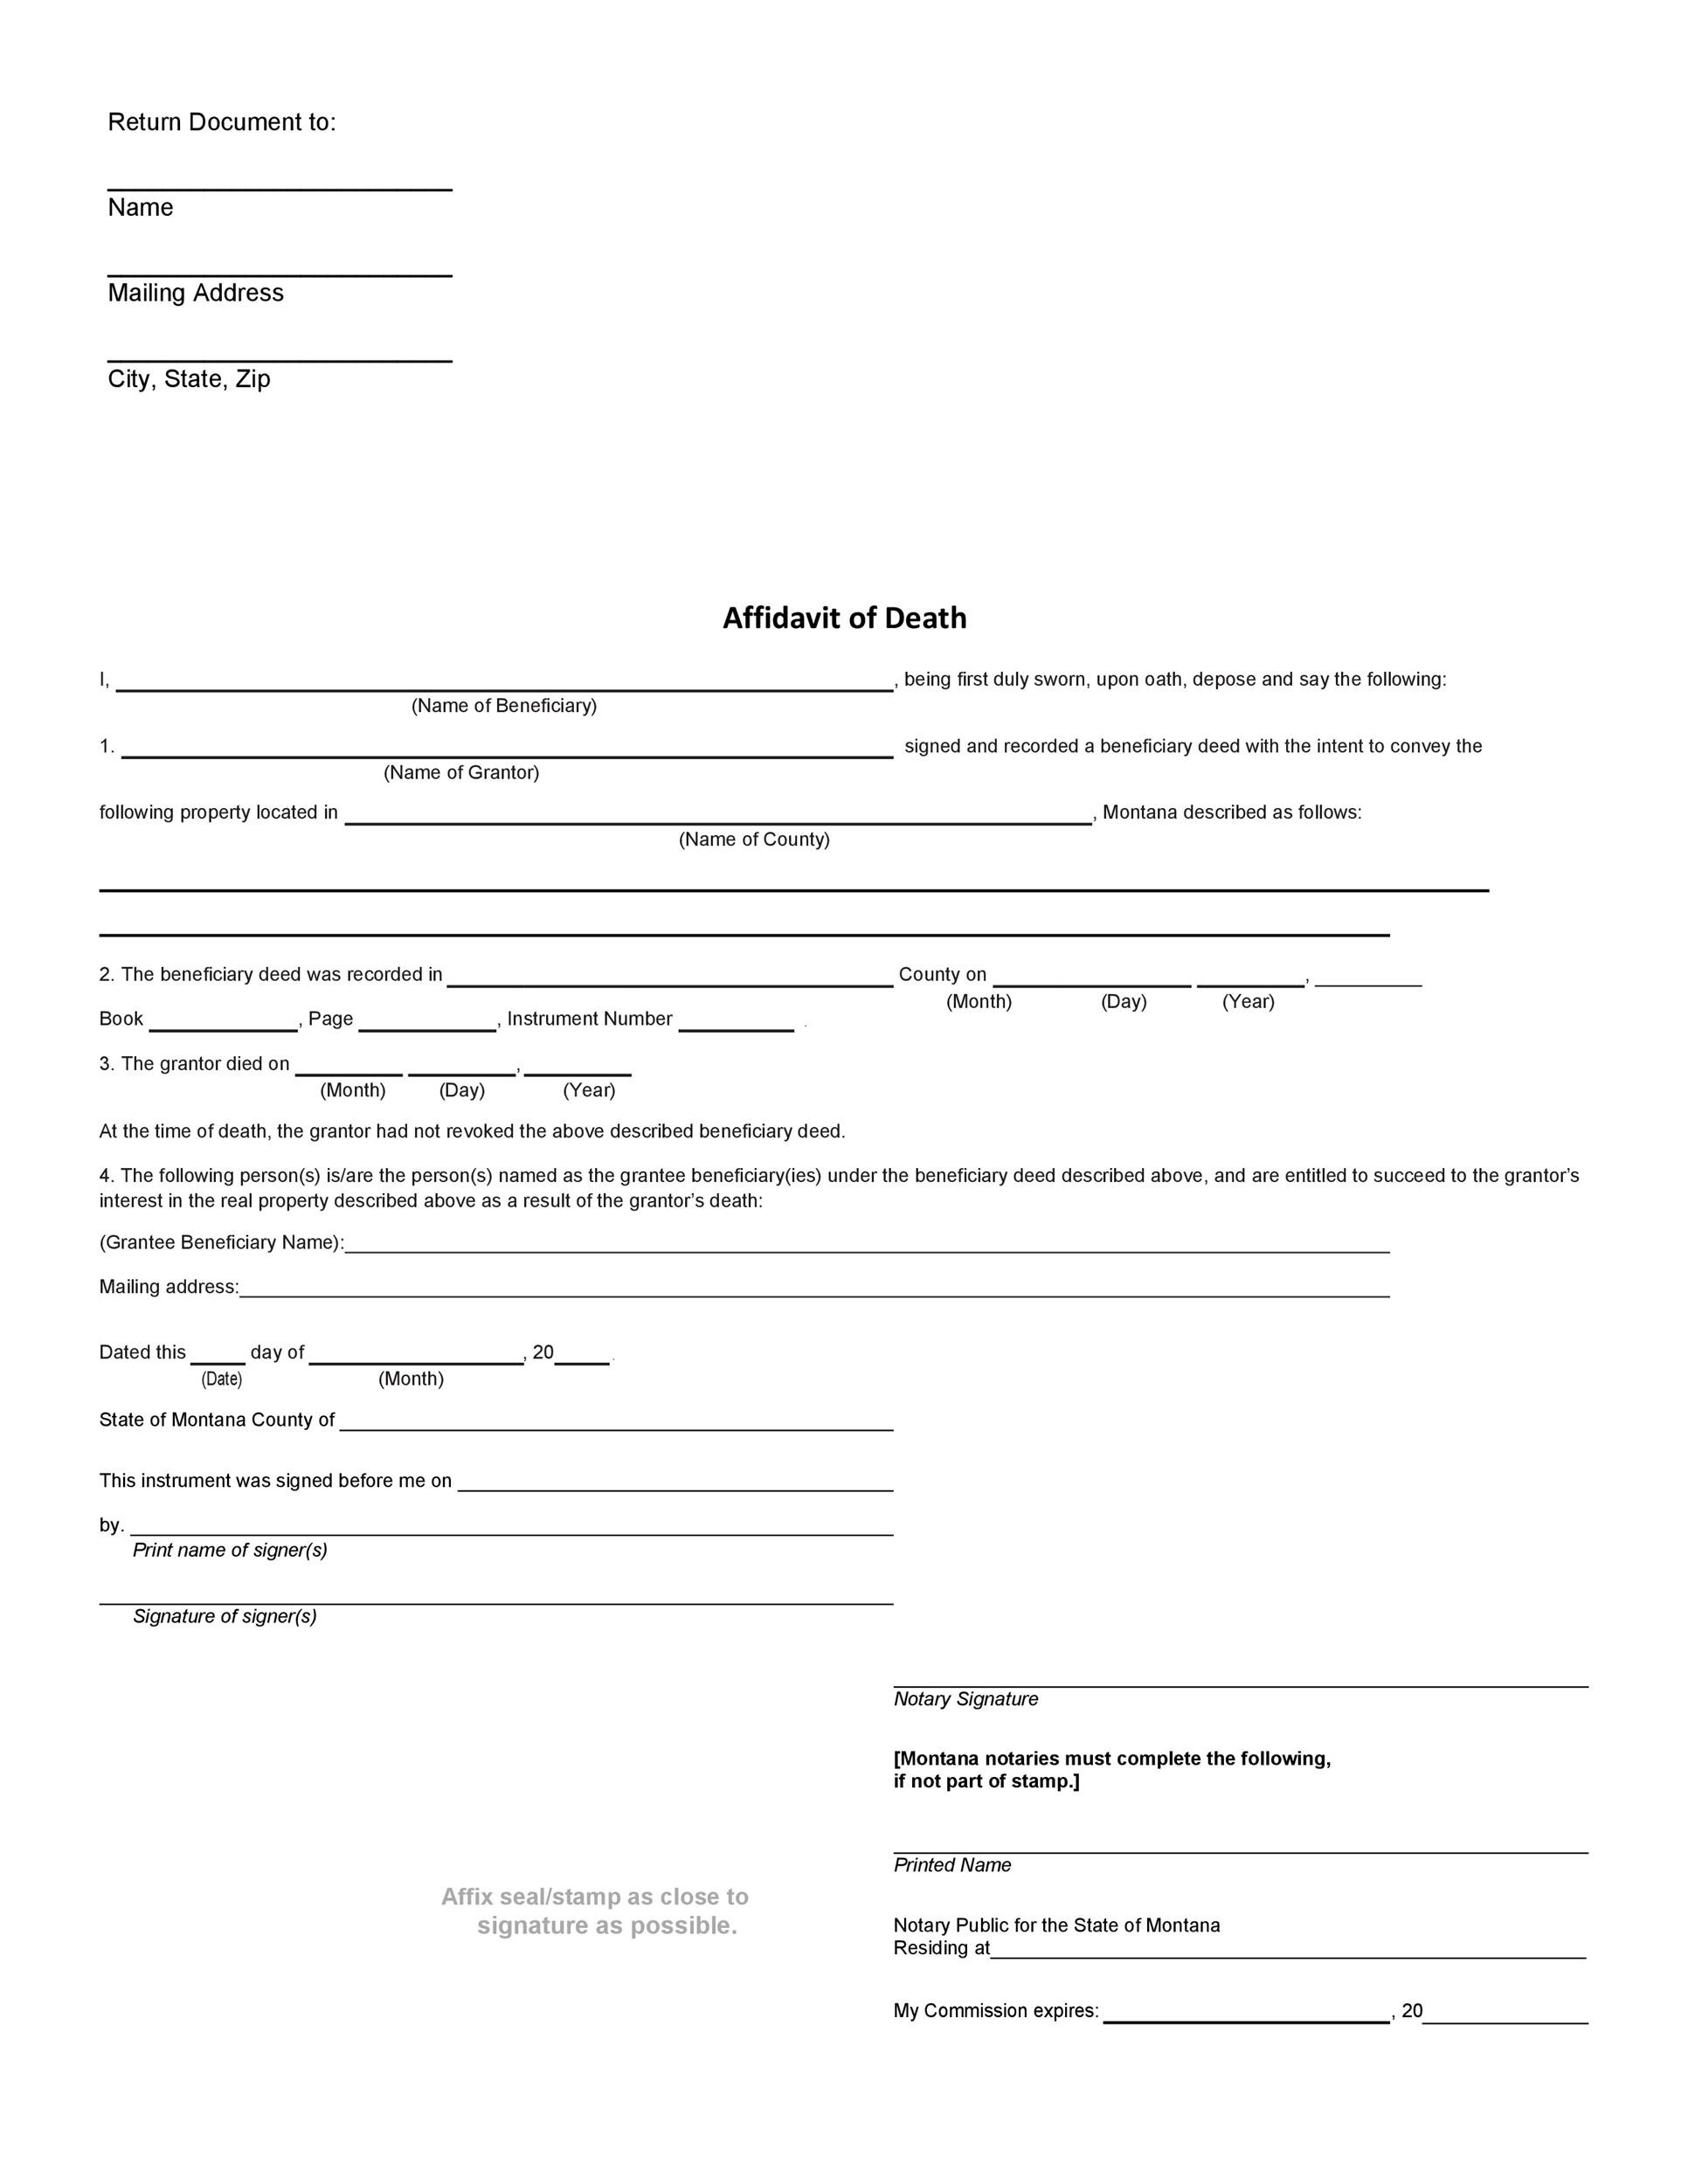 Free affidavit of death 11